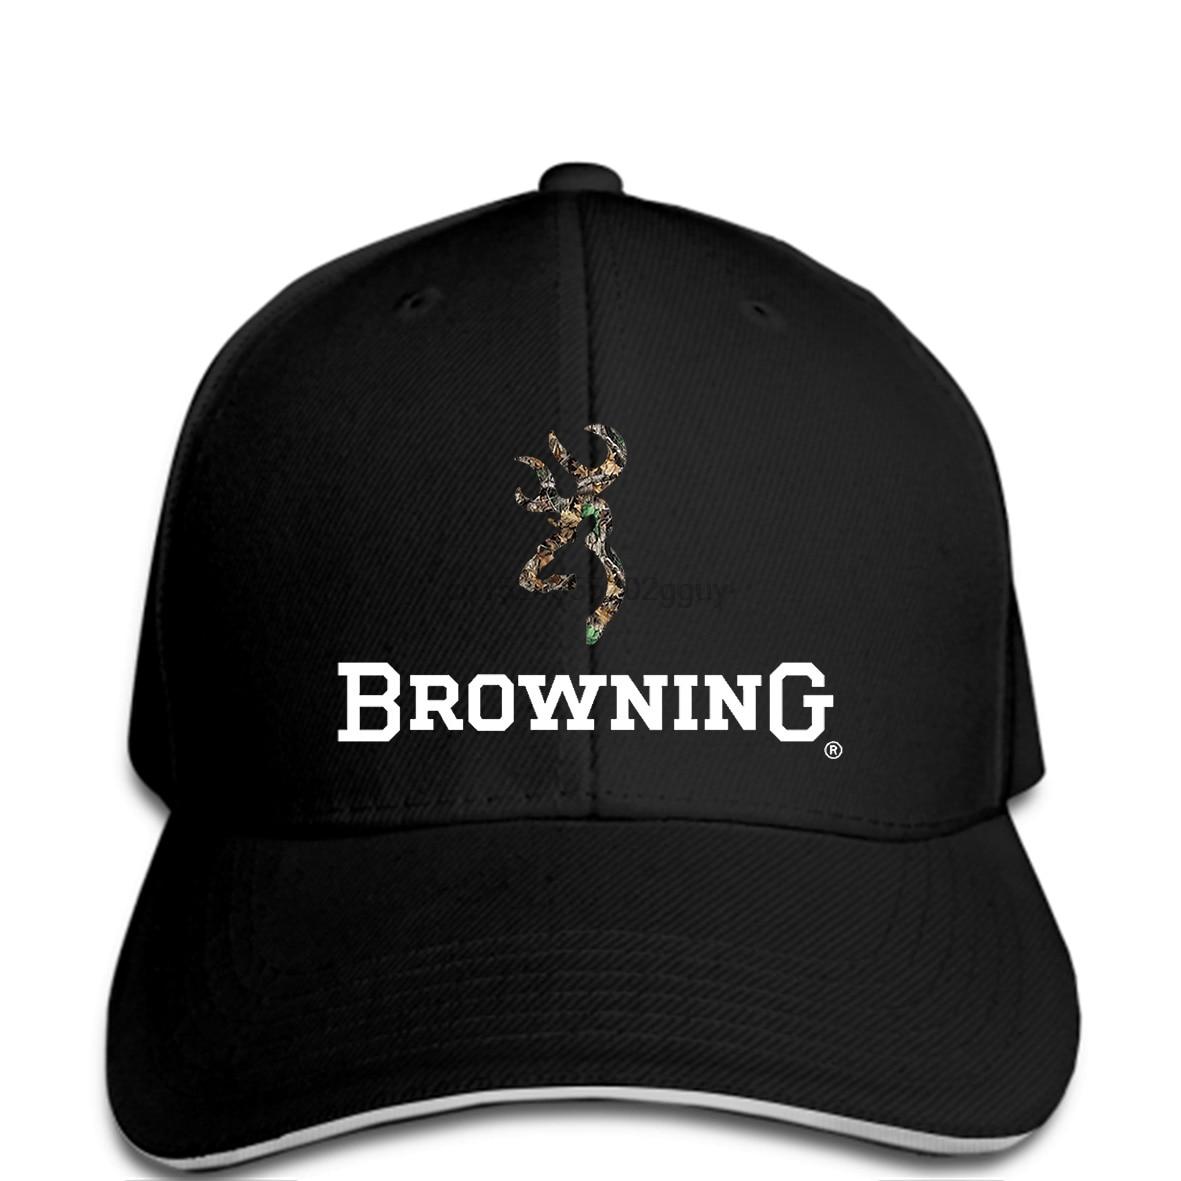 7b0eaa7d6f8333 Detail Feedback Questions about Browning Buck Deer LOGO Baseball cap Men on  Aliexpress.com   alibaba group